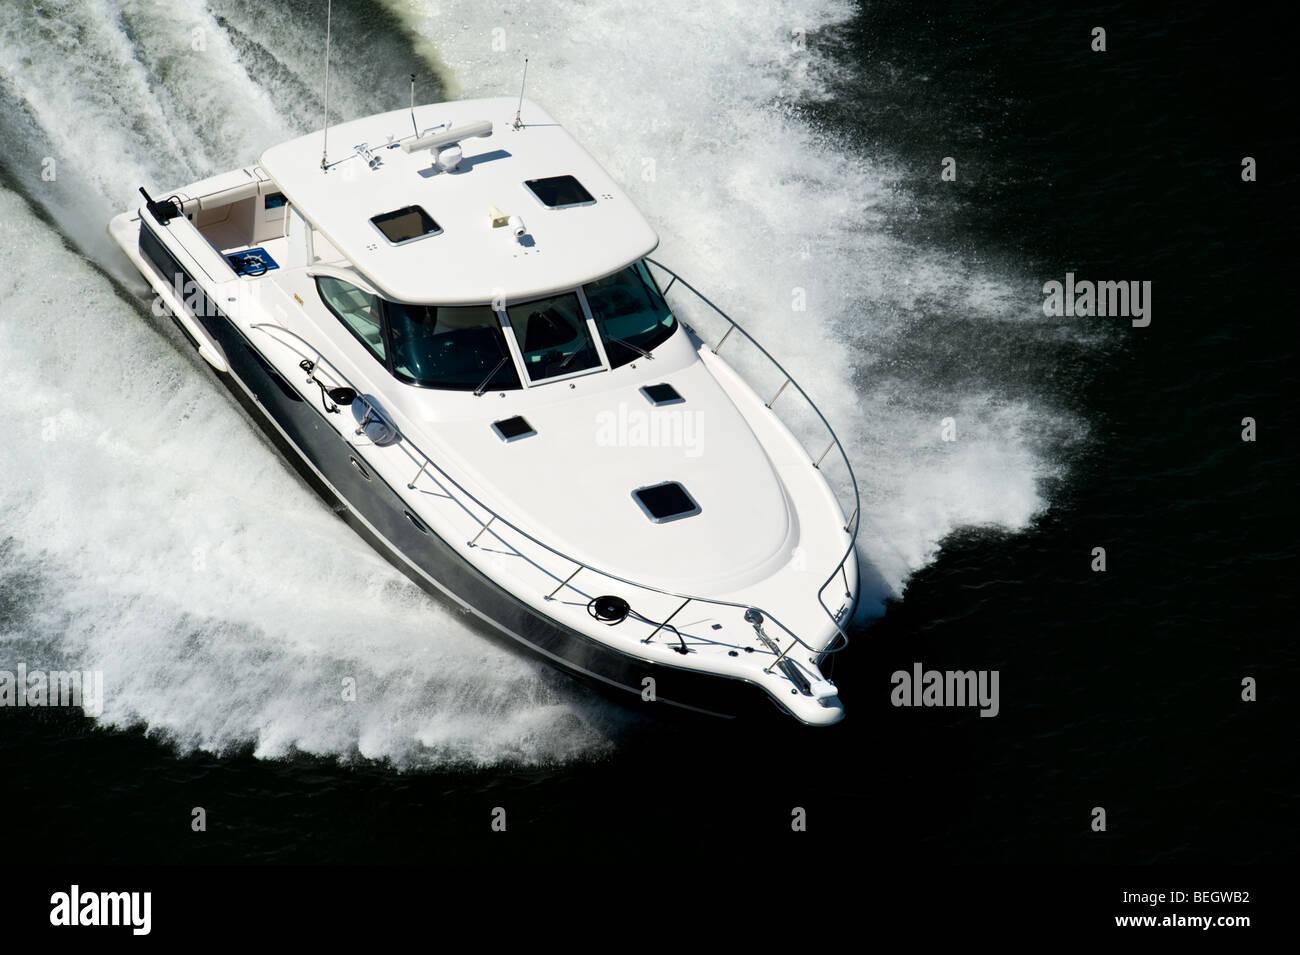 speed boat - Stock Image